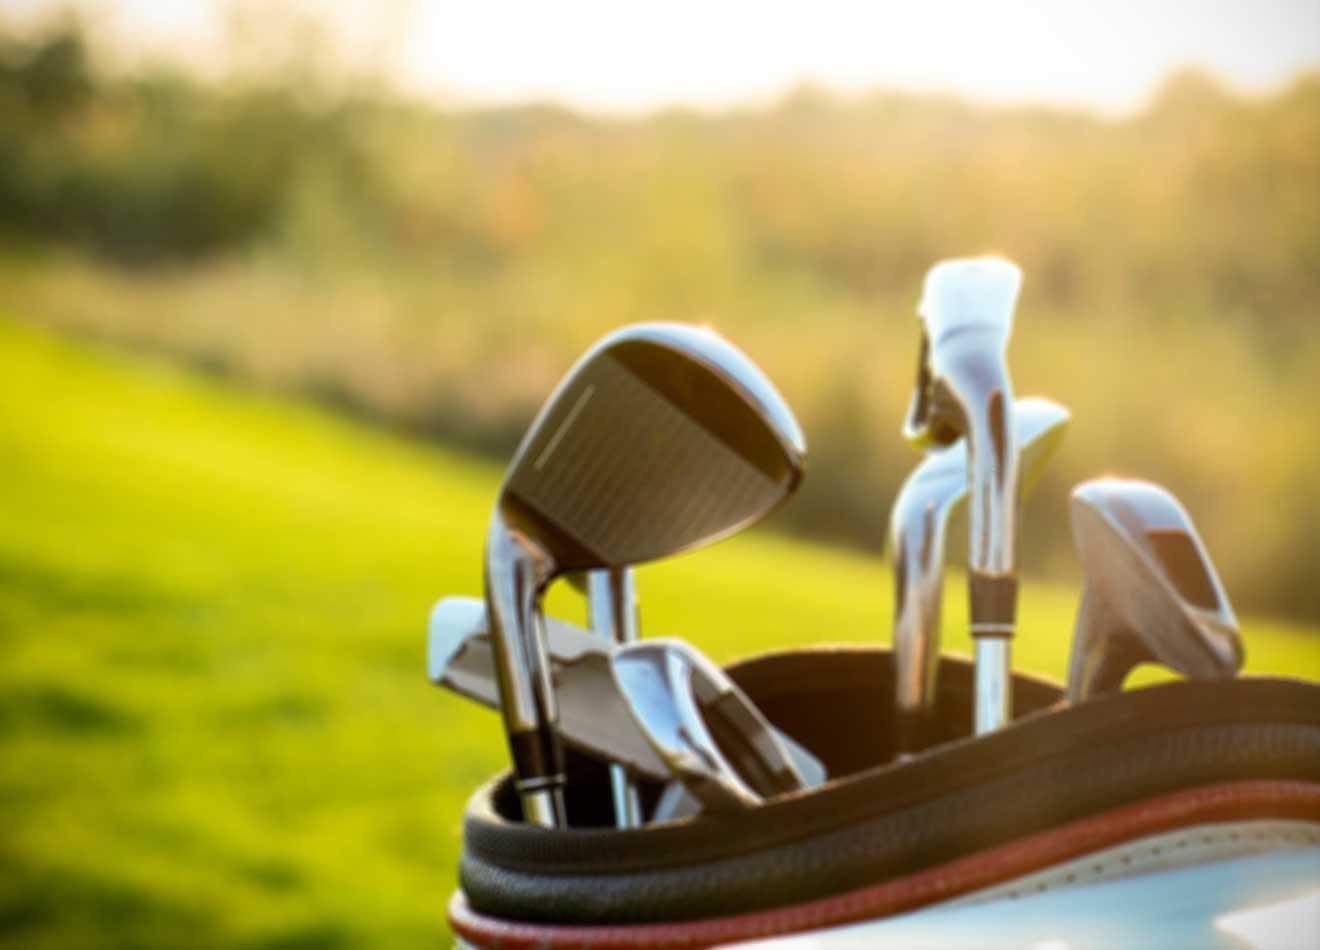 2021 President's Scholars Golf Tournament Registration